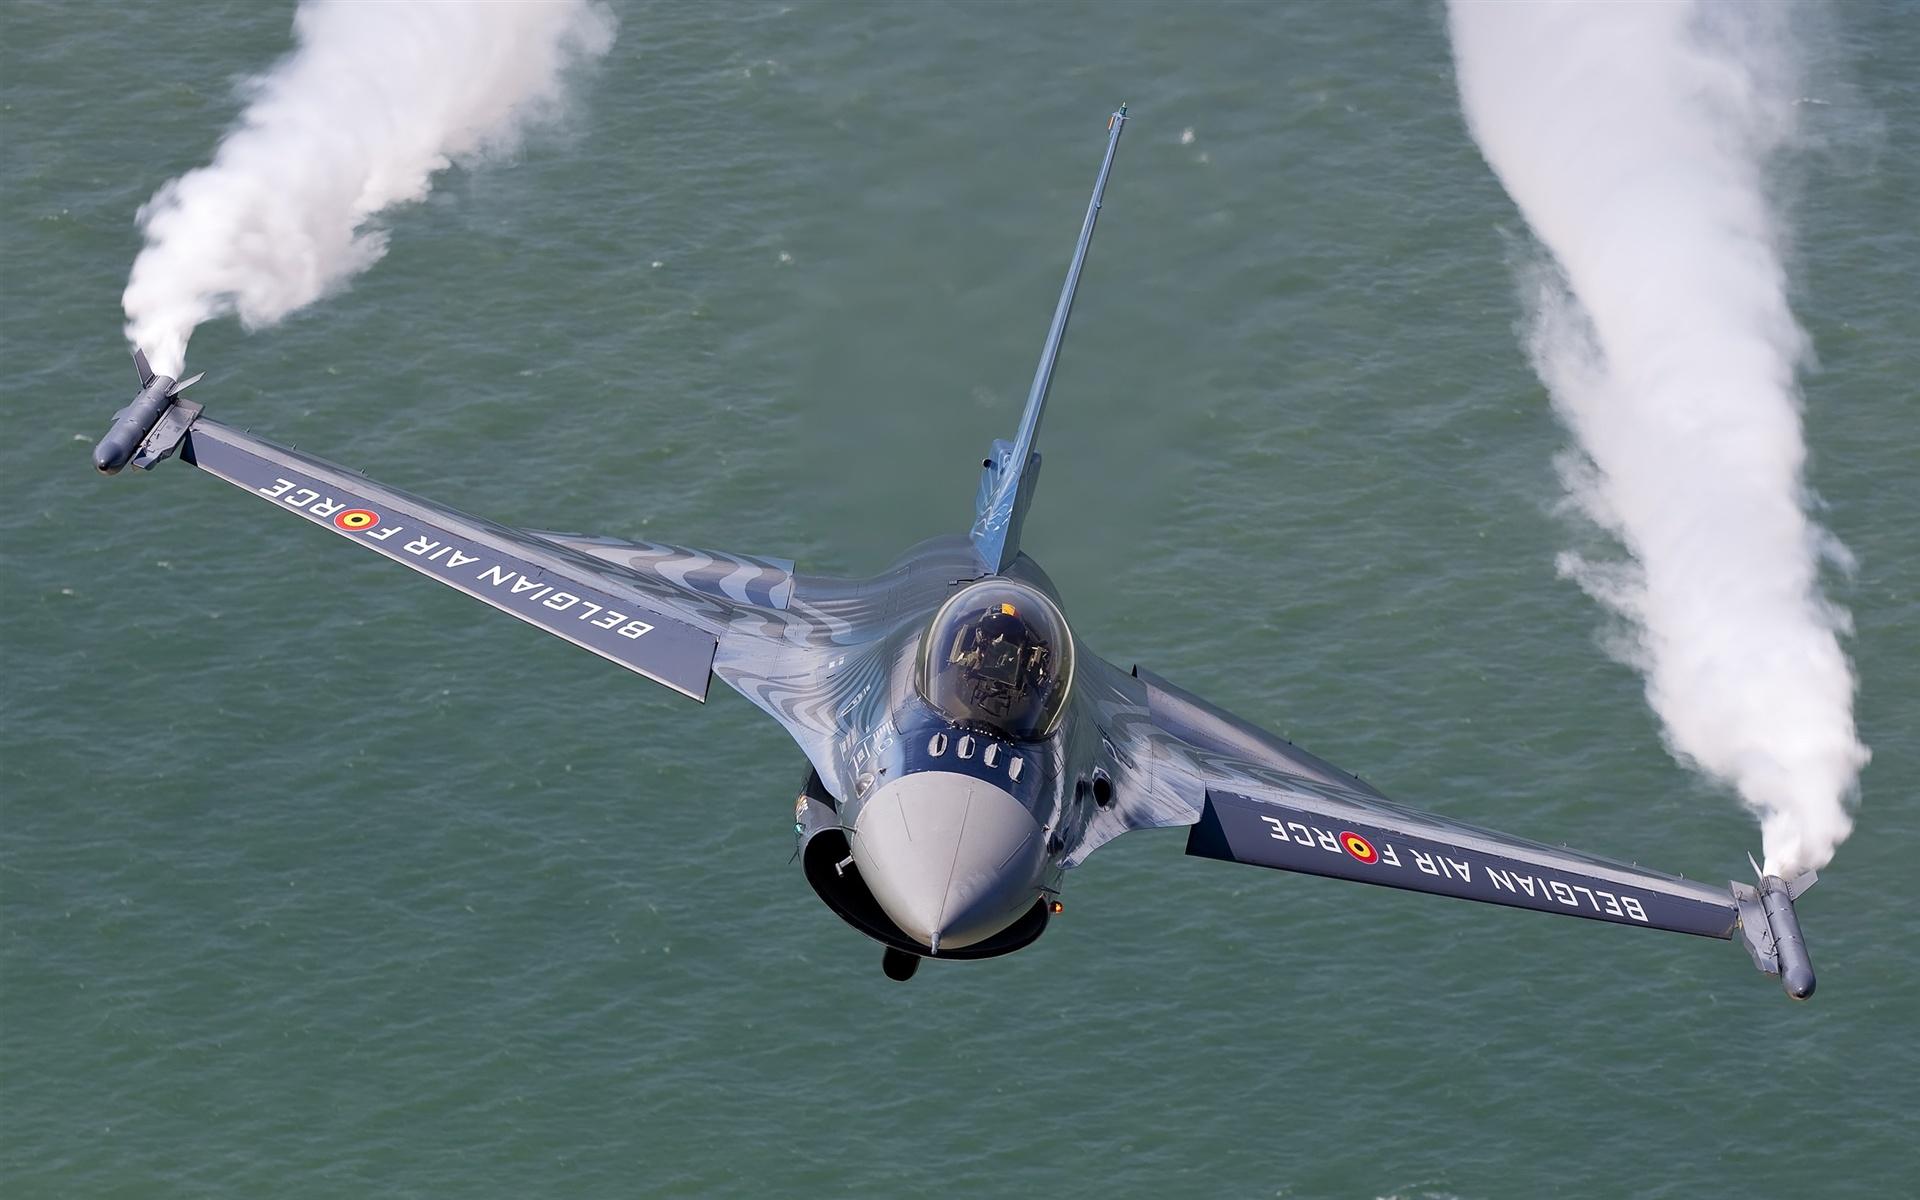 F 16 (戦闘機)の画像 p1_38